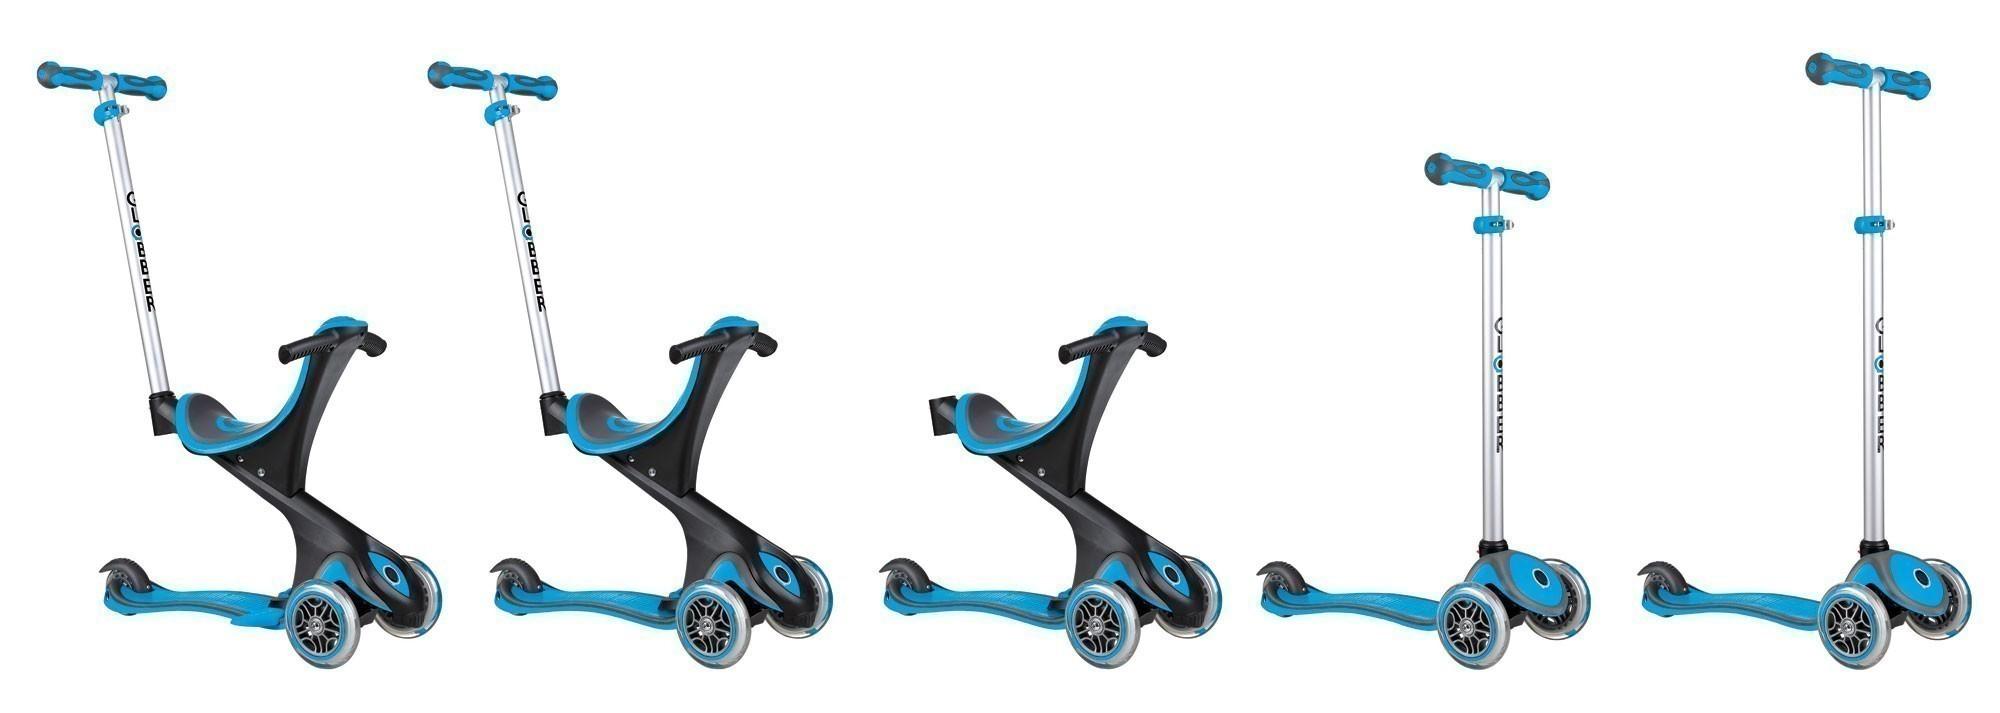 Scooter Kinderroller Dreirad Laufrad Globber Evo Comfort 5in1 himmelbl Bild 6